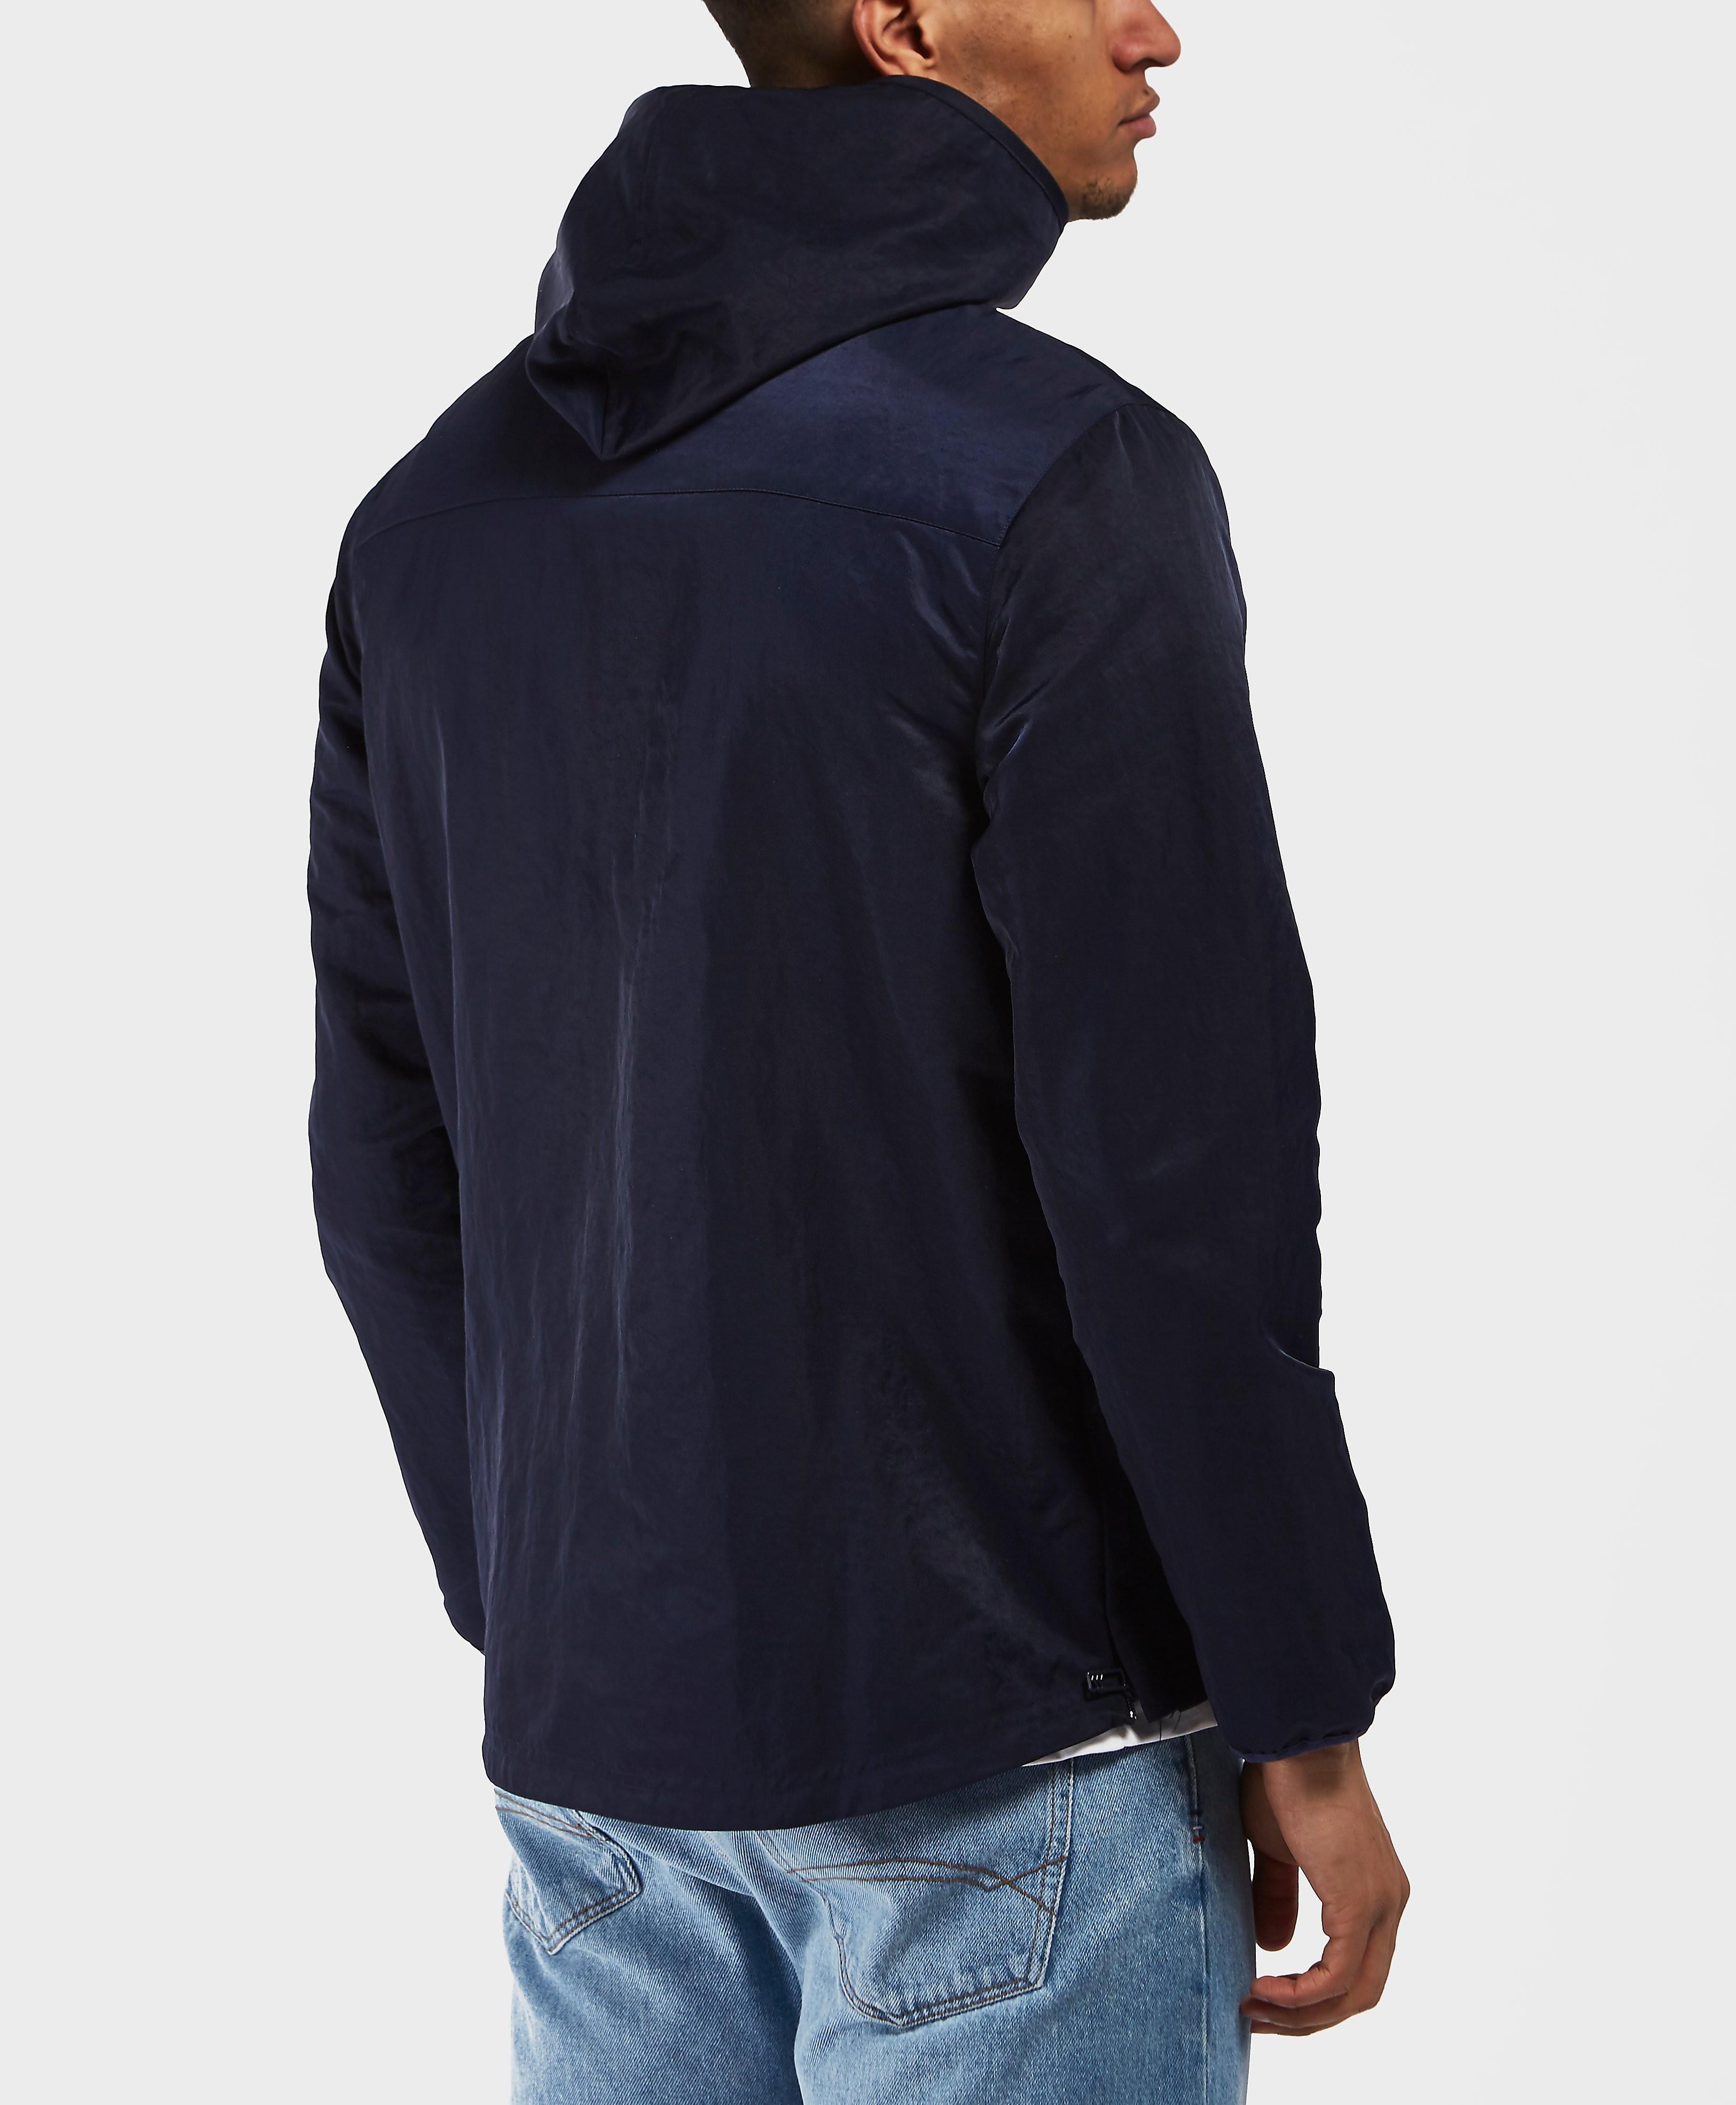 Gio Goi Funnel Overhead Lightweight Jacket